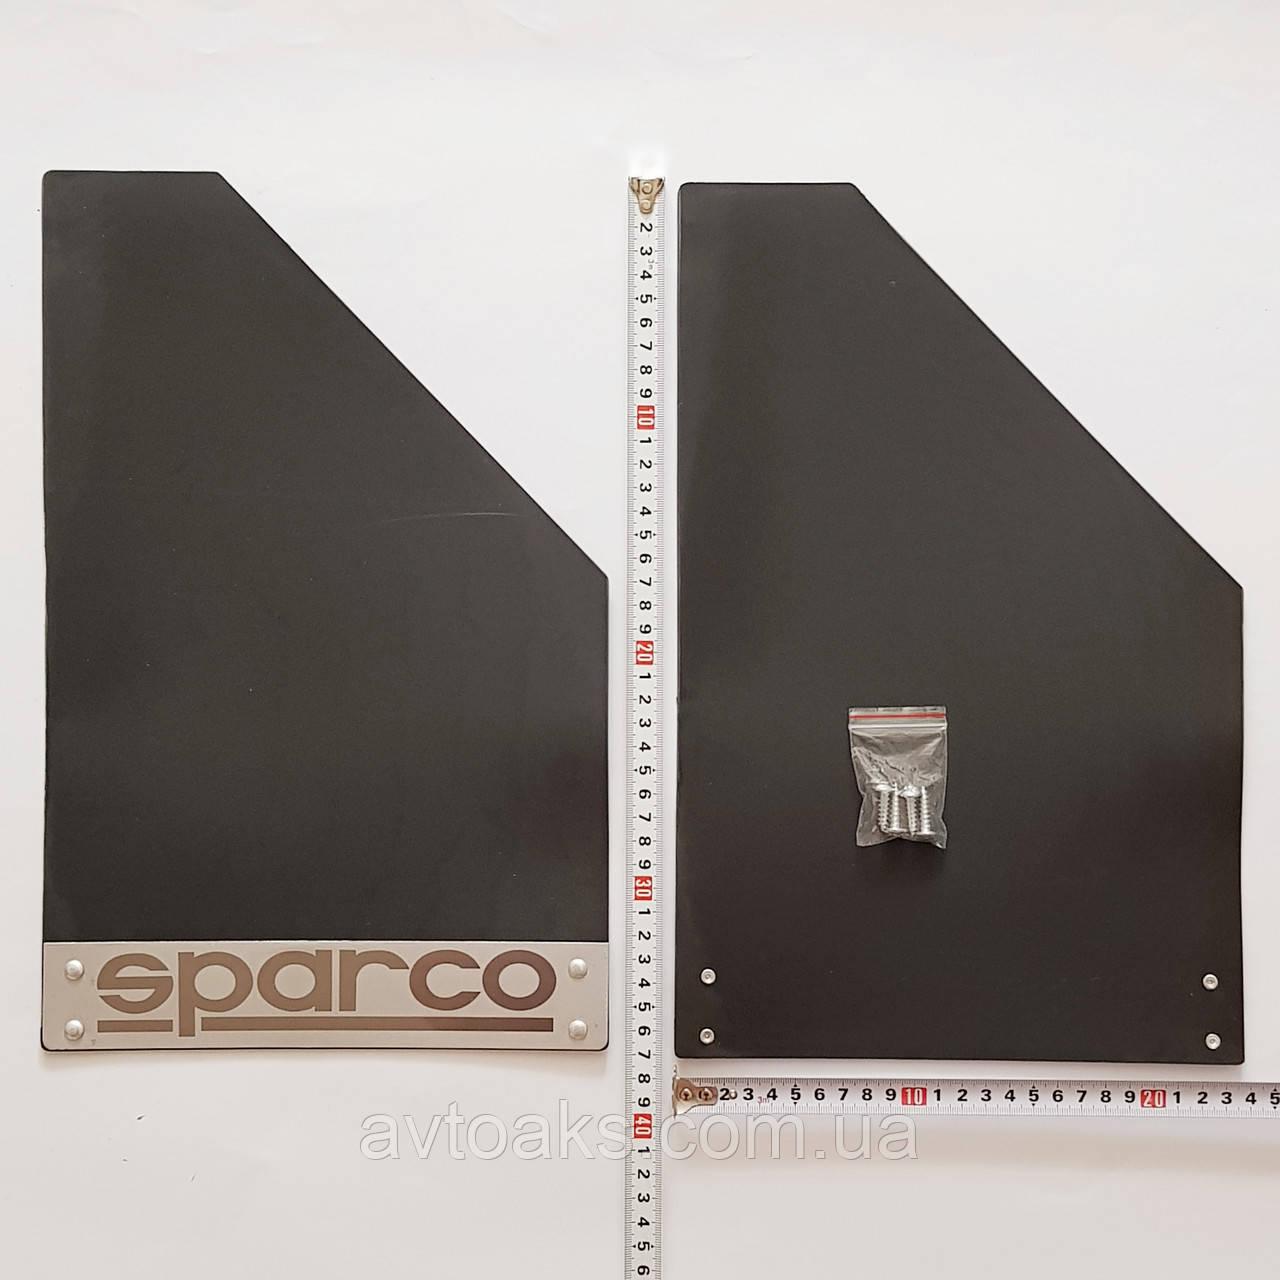 Брызговик тюнинговый, пластиковый SPARCO, 370х240 мм. с пластиной